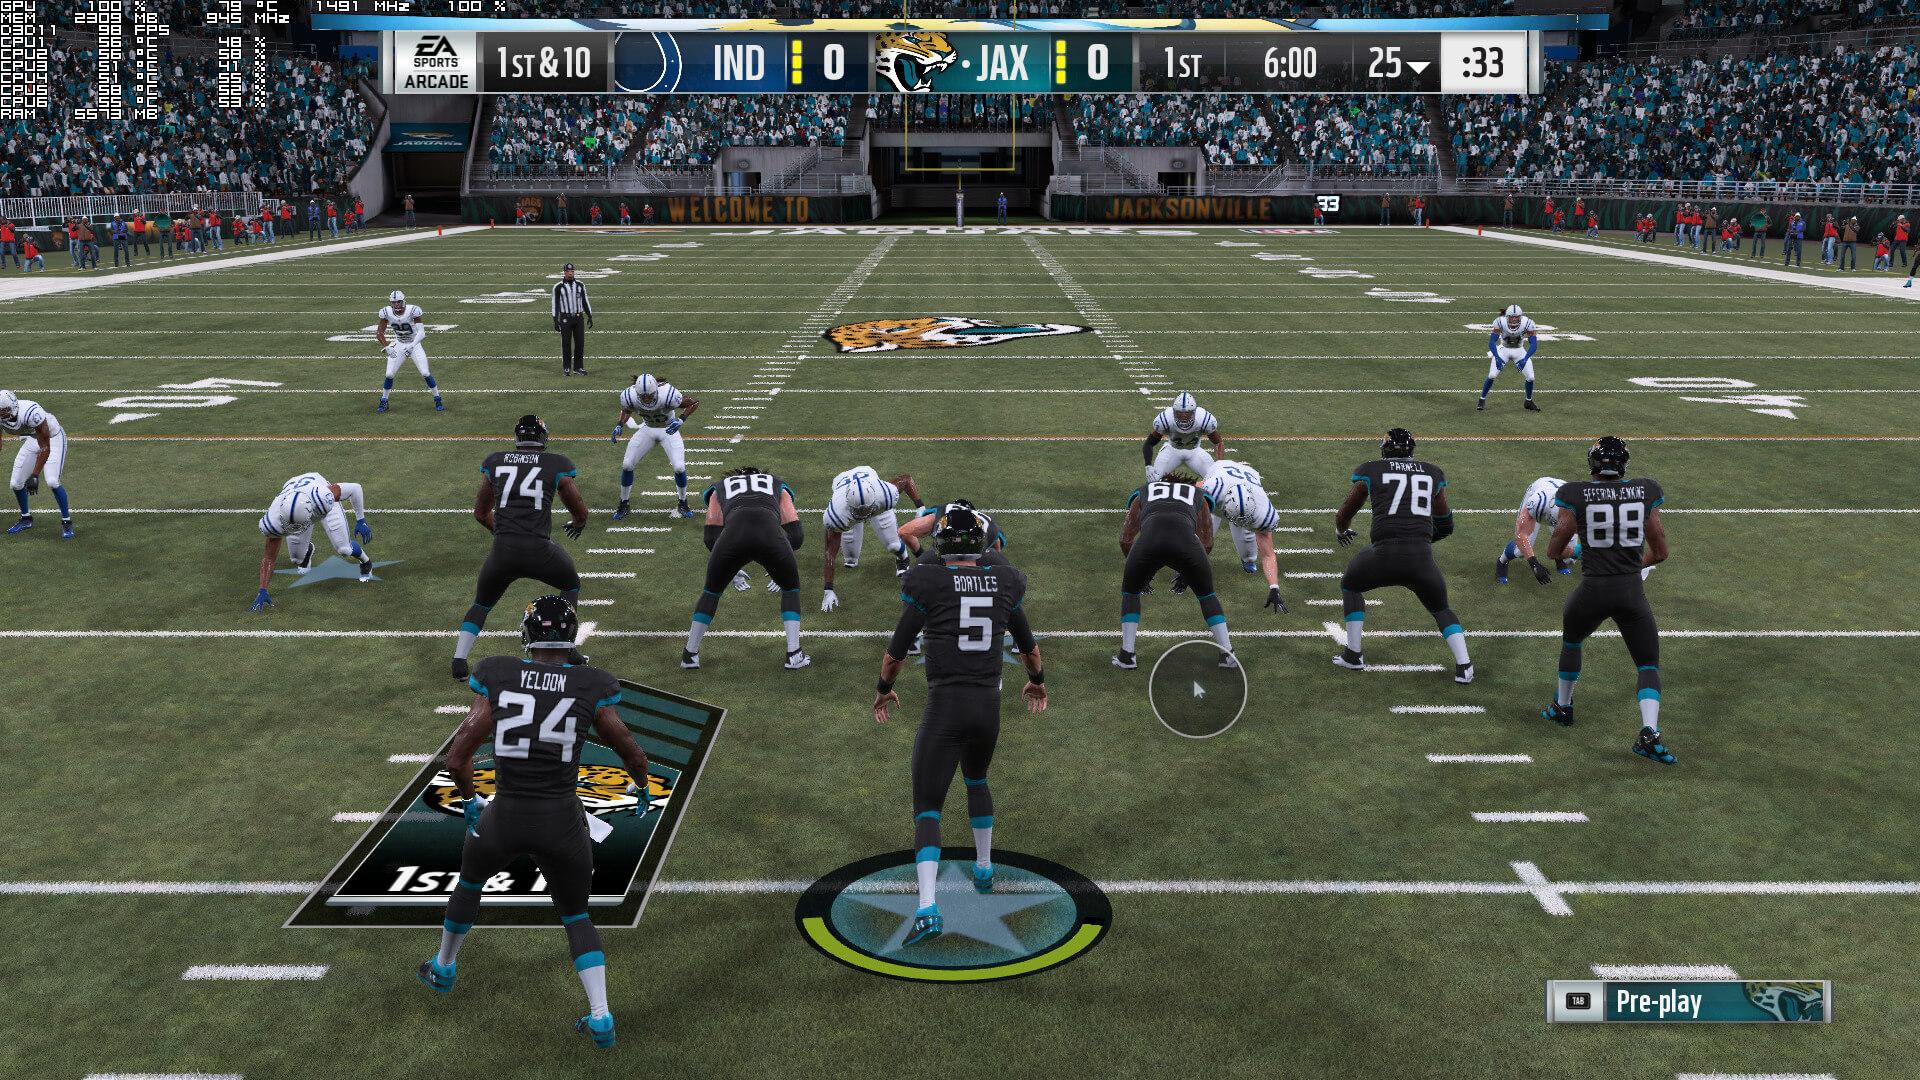 Madden NFL 19 PC Performance Analysis - DSOGaming